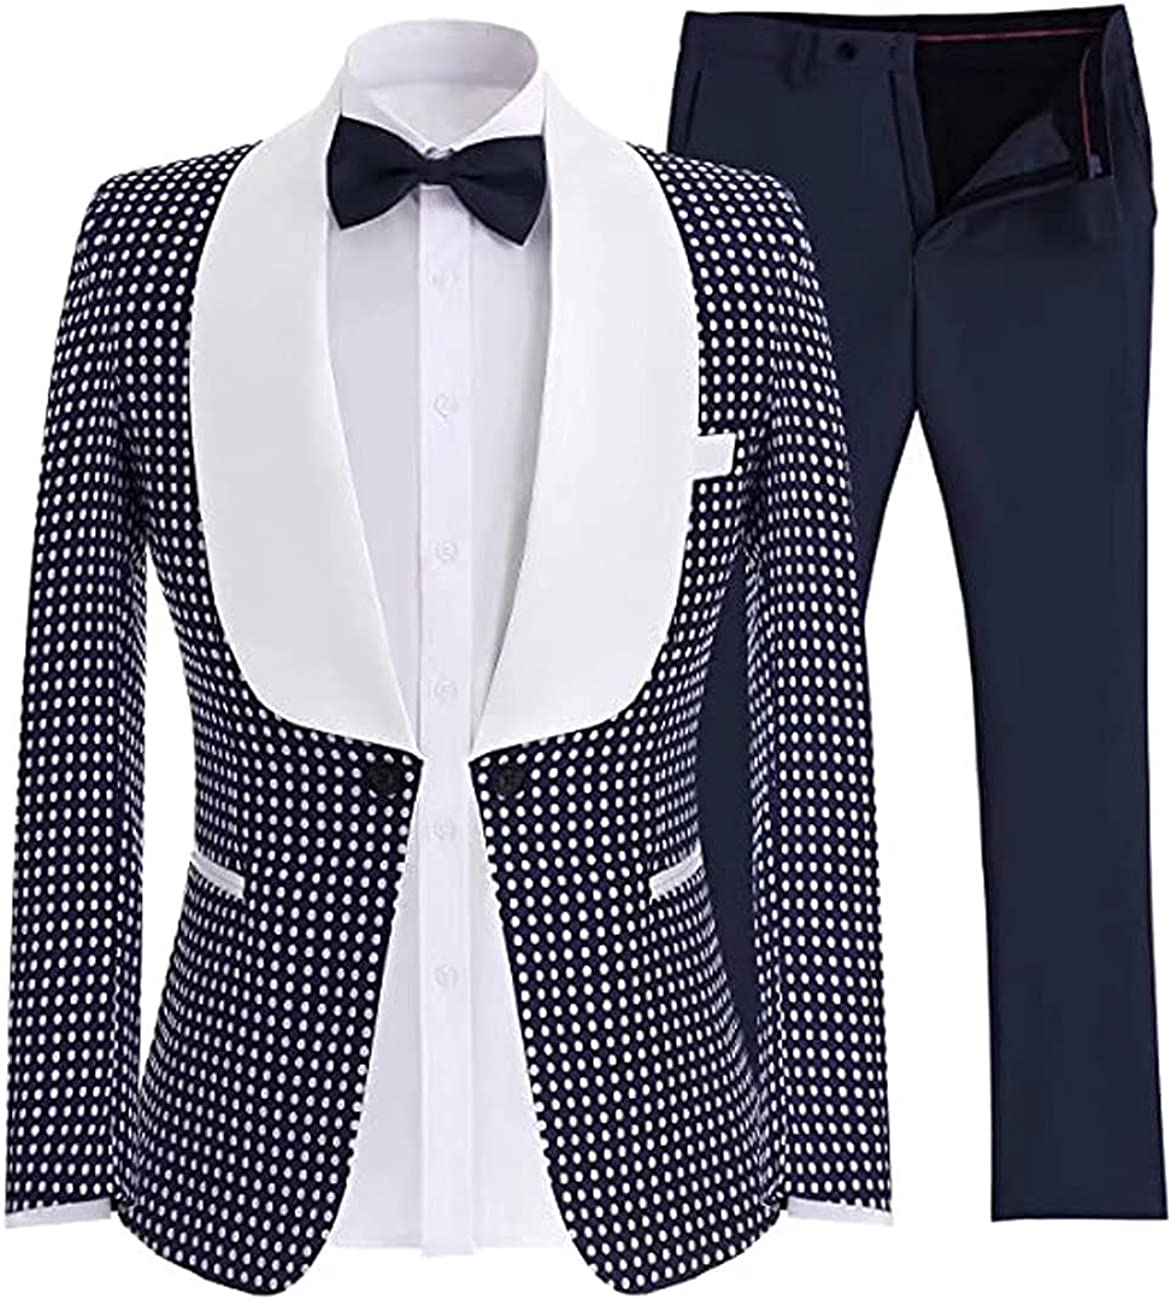 Wangyue 2 Pcs Men's Polka Dot Suit,Fashion Slim Casual One Button Blazer Pants Tuxedo for Wedding